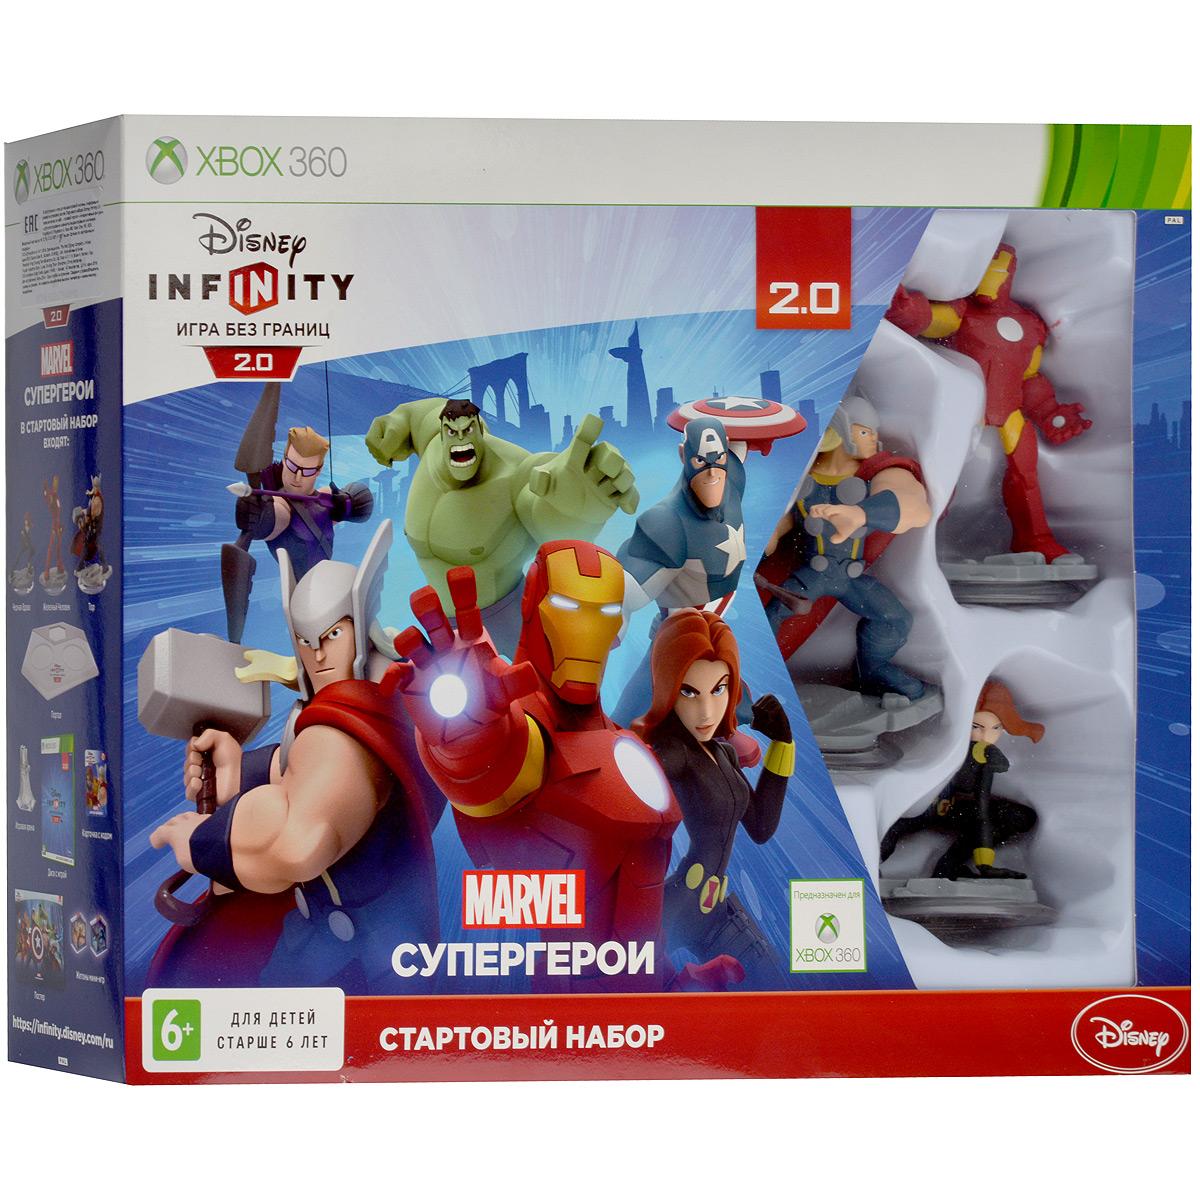 Disney Infinity 2. 0 (Marvel). Стартовый набор (Xbox 360)